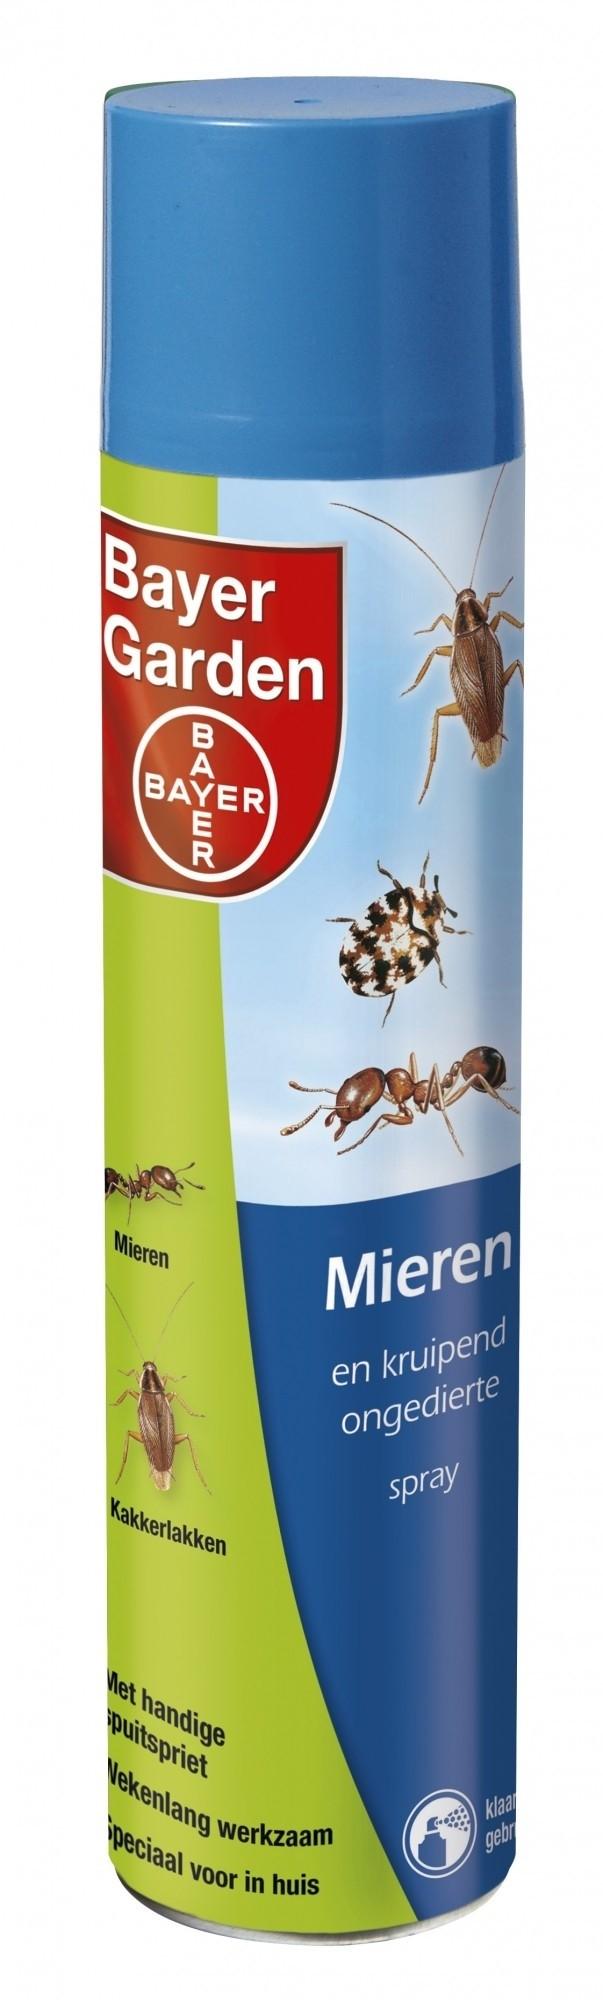 Mieren en kruipen ongediertespray 400ml